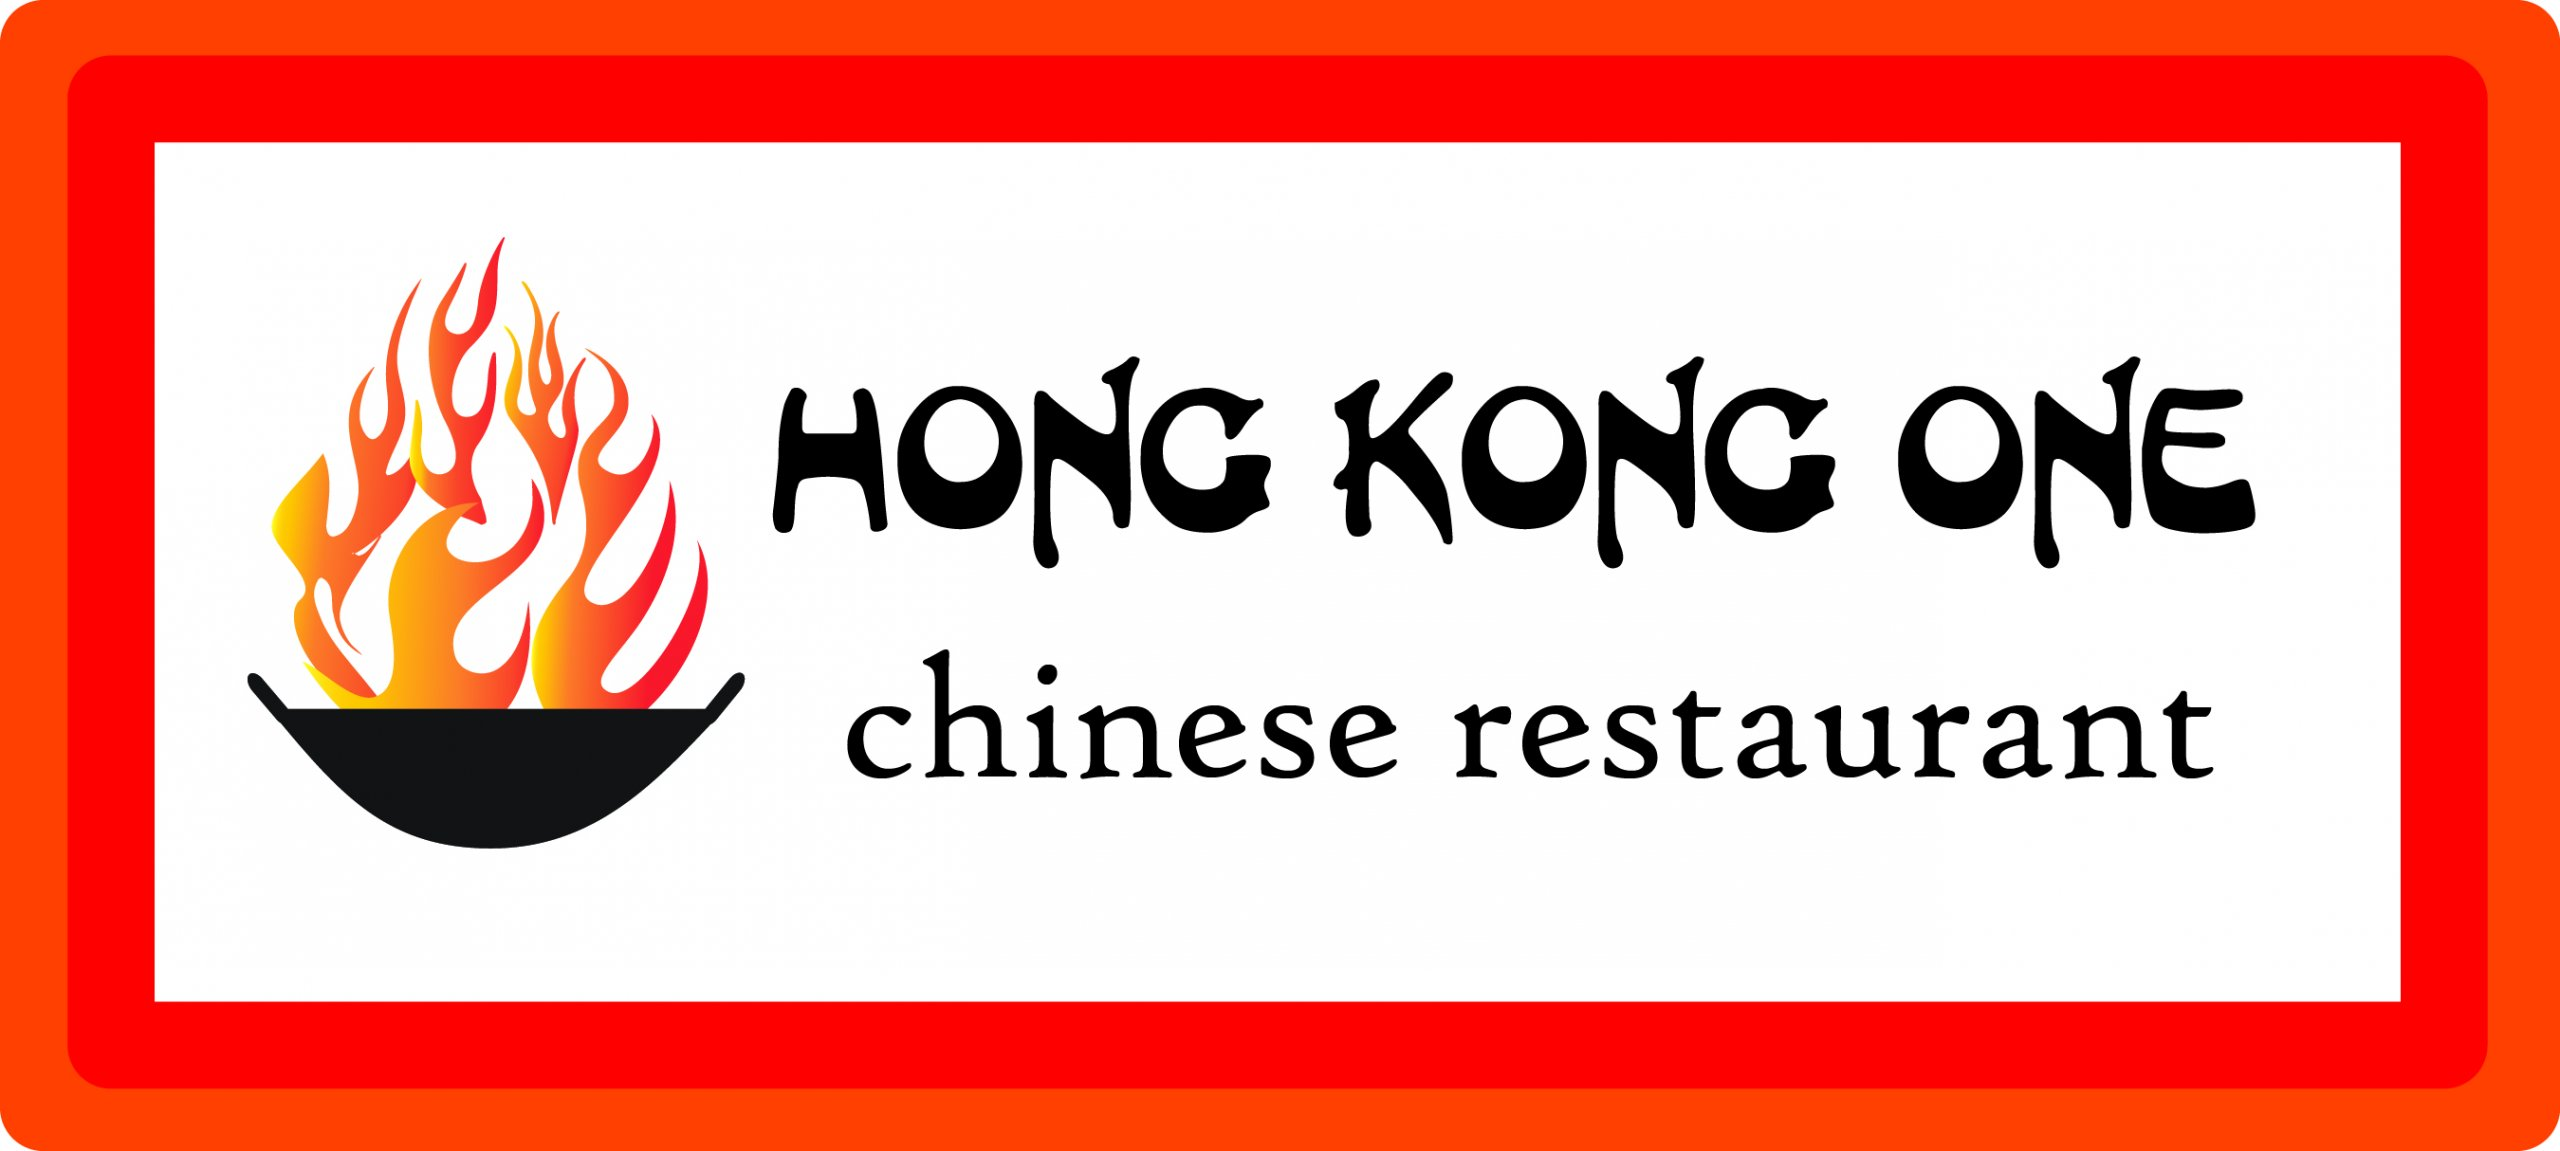 Hong Kong One